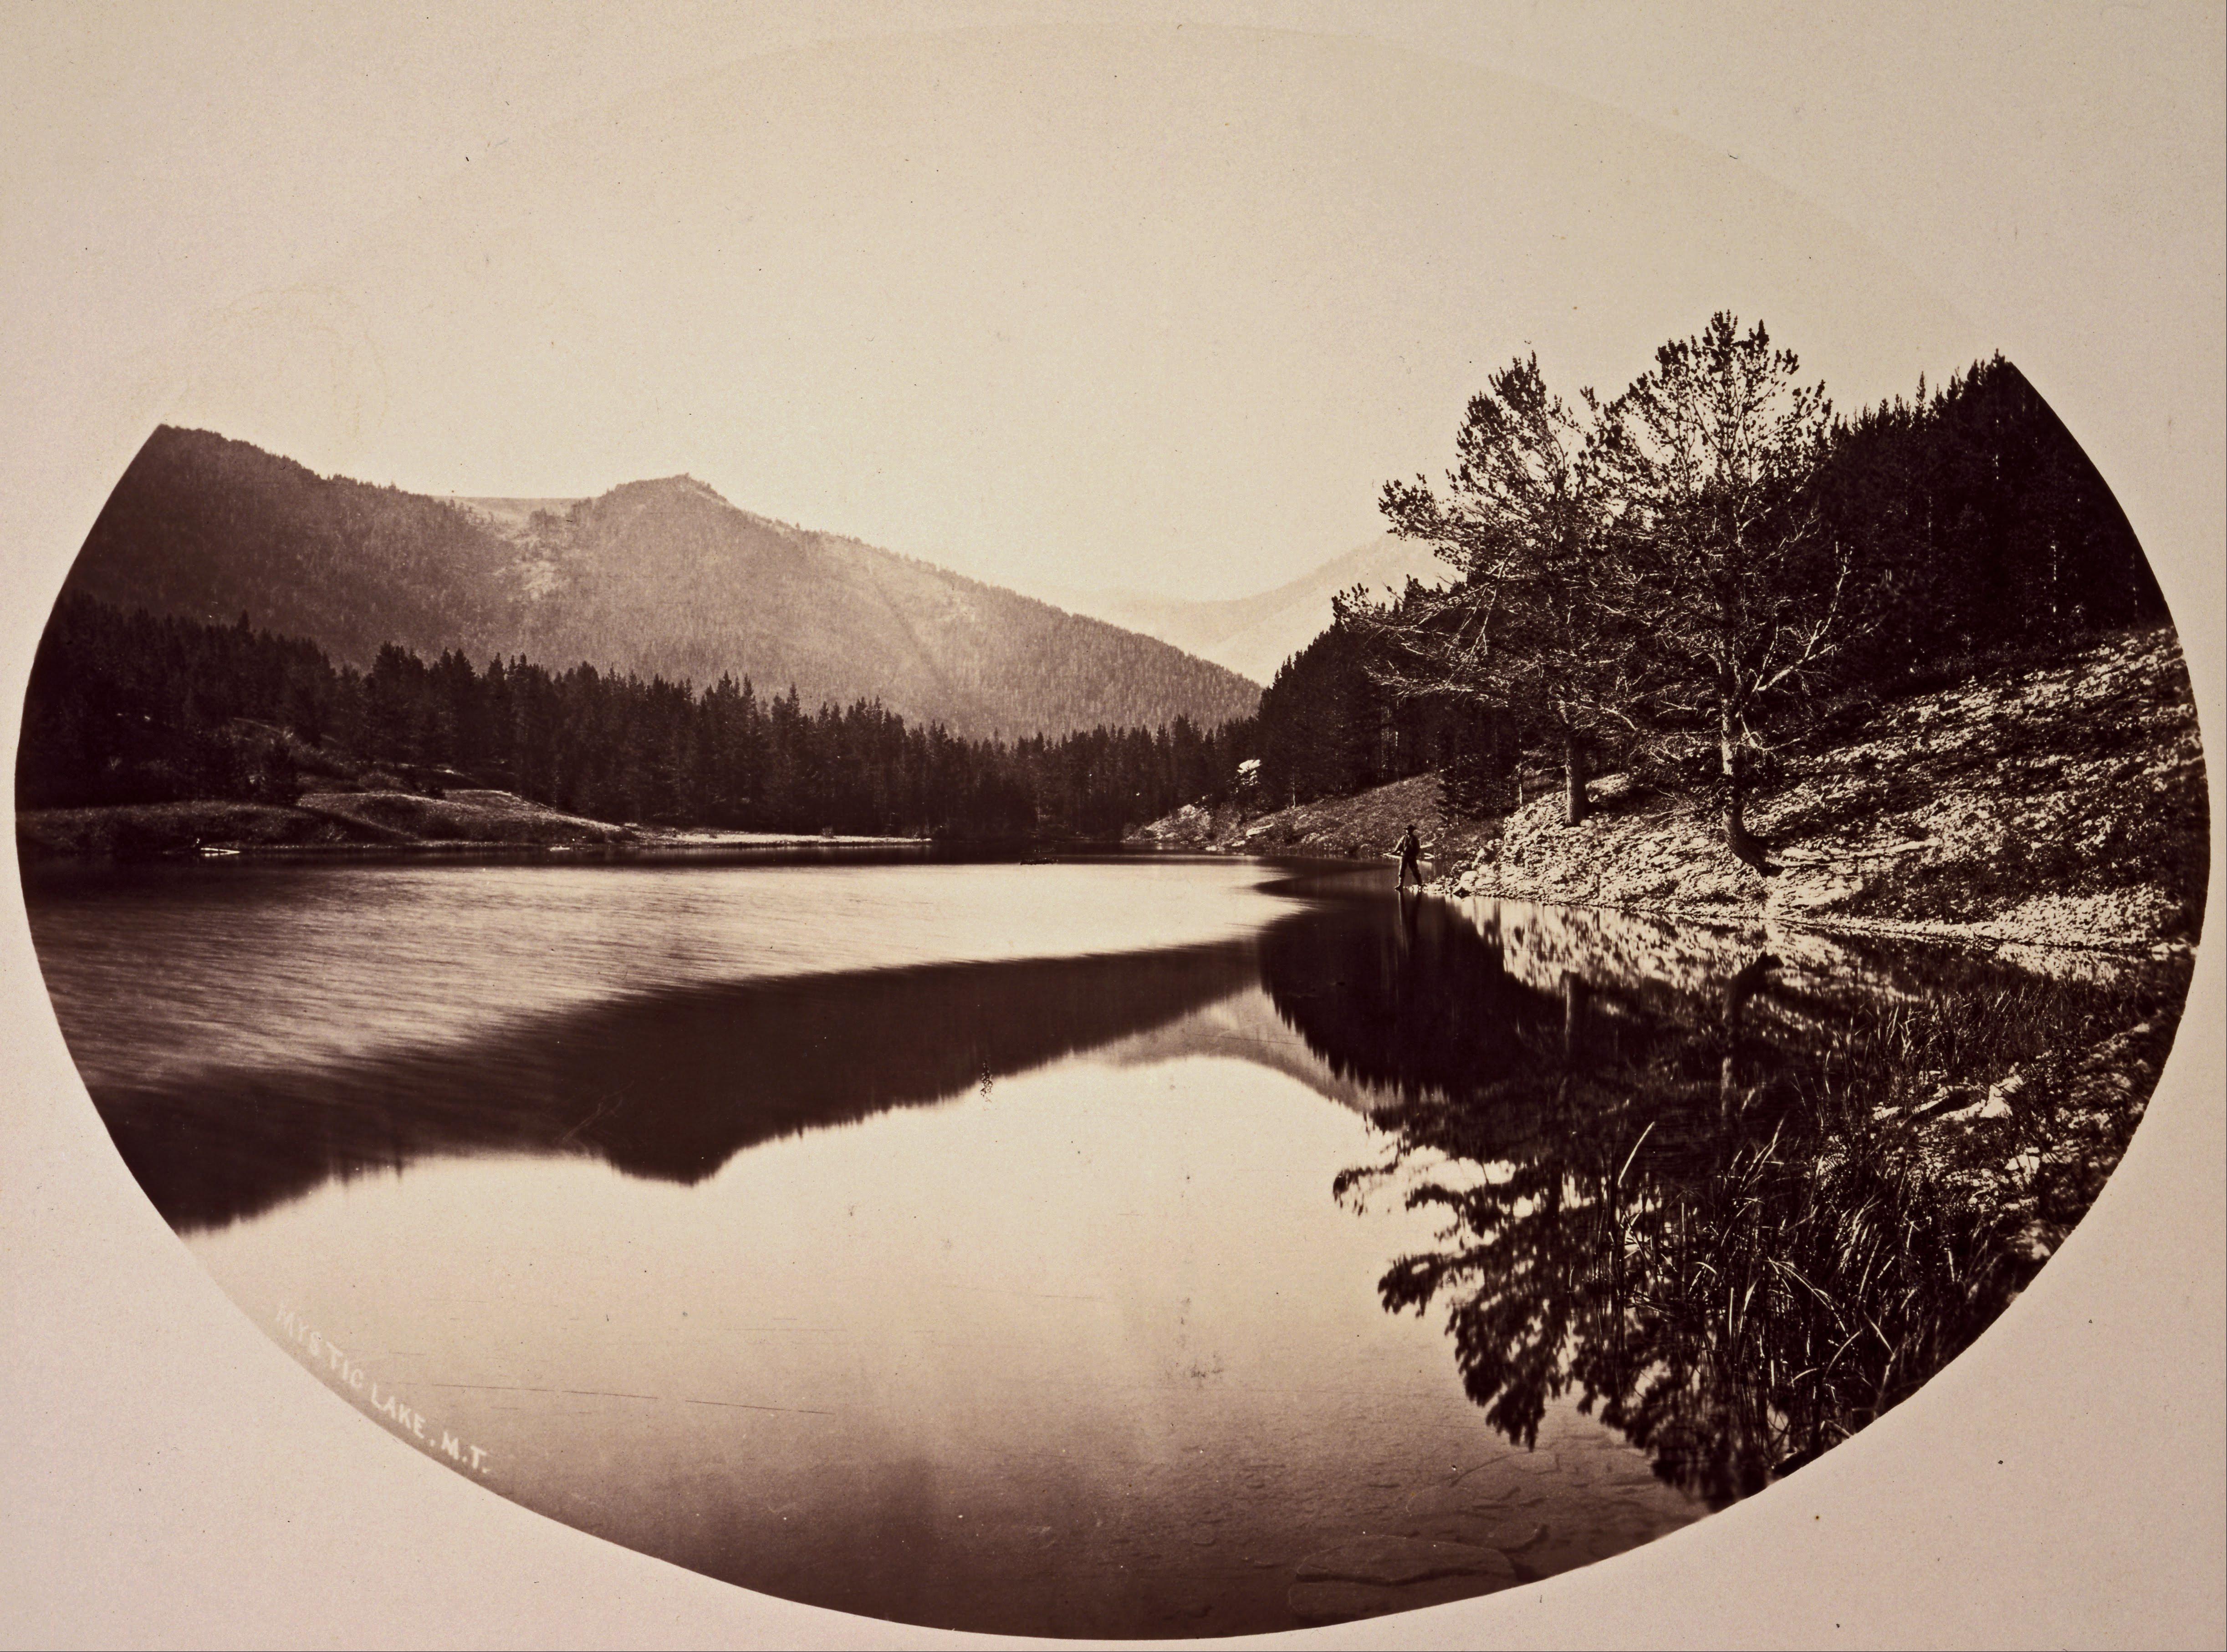 William Henry Jackson - 'Mystic Lake' albumen print 1872 {{PD}}